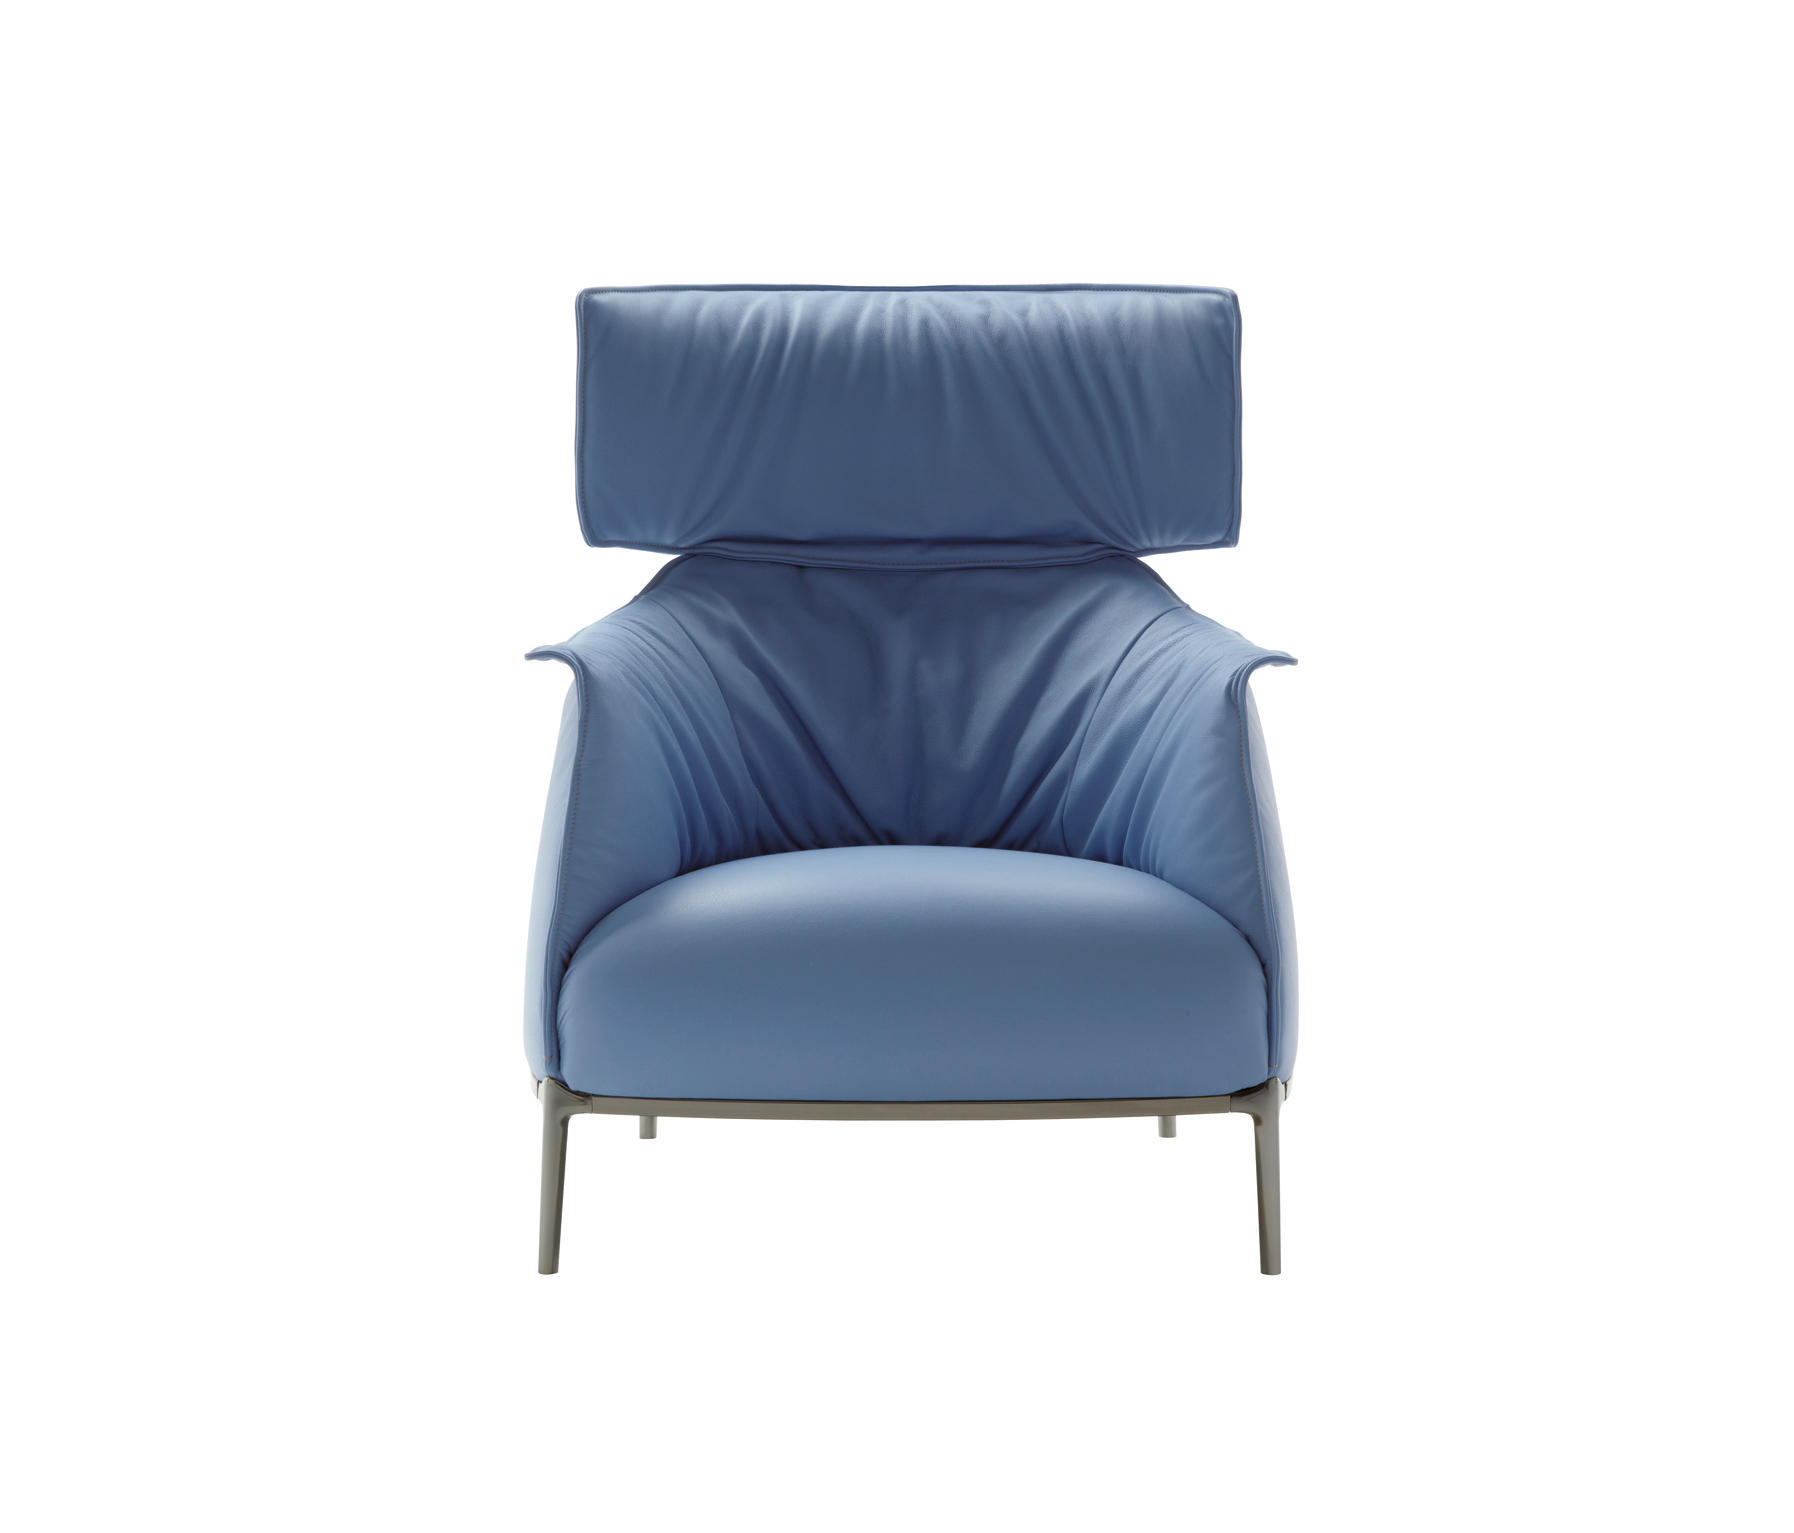 Archibald king armchairs from poltrona frau architonic - Archibald poltrona frau ...